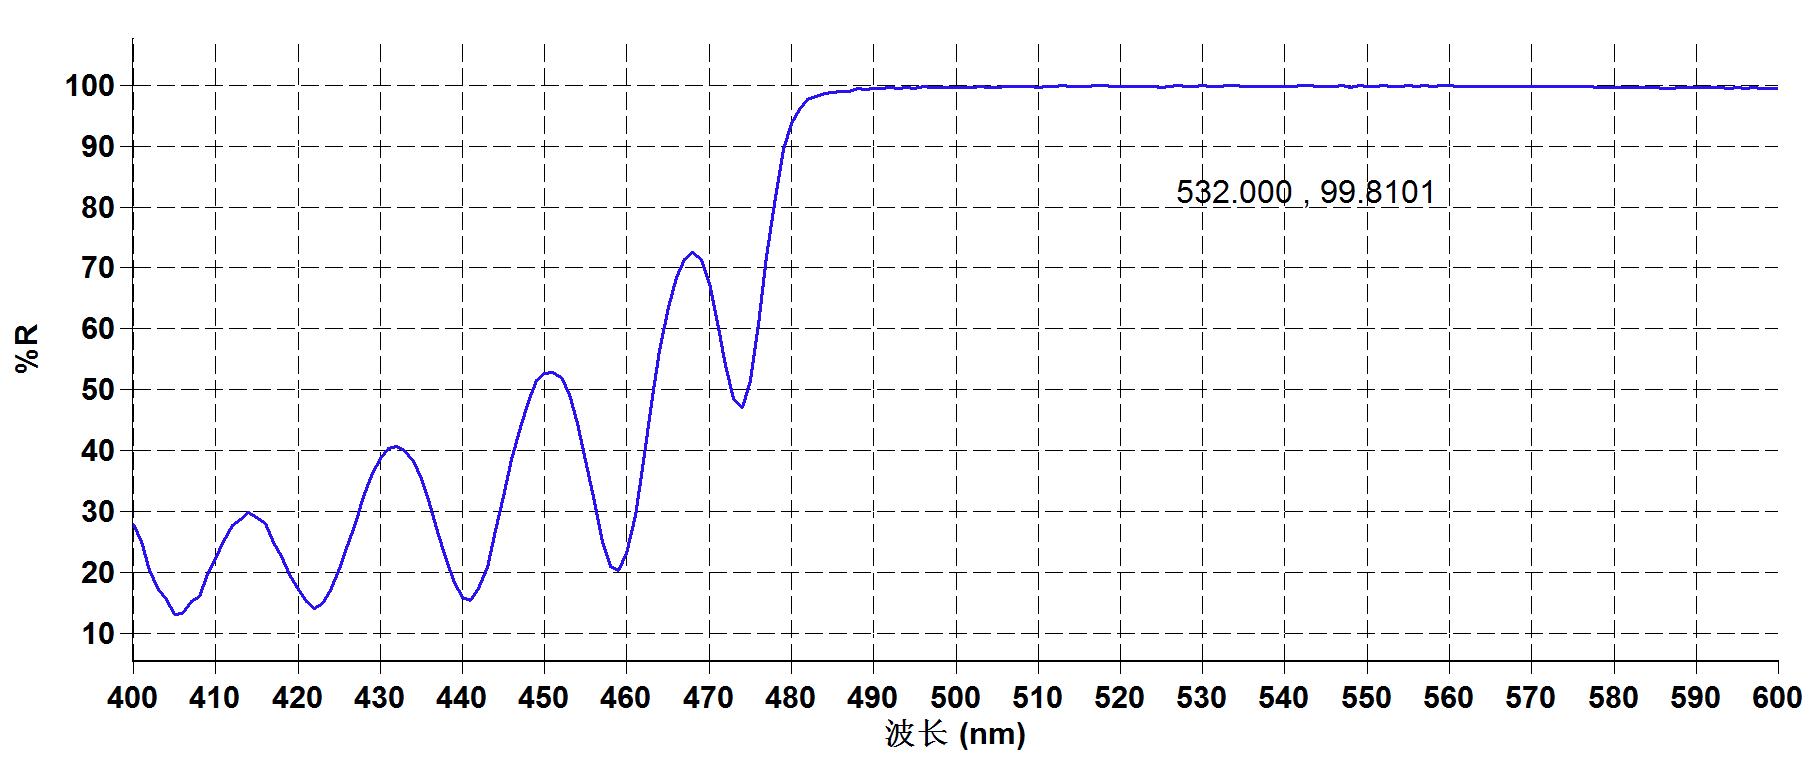 JGS1光学石英玻璃532nm处反射率曲线